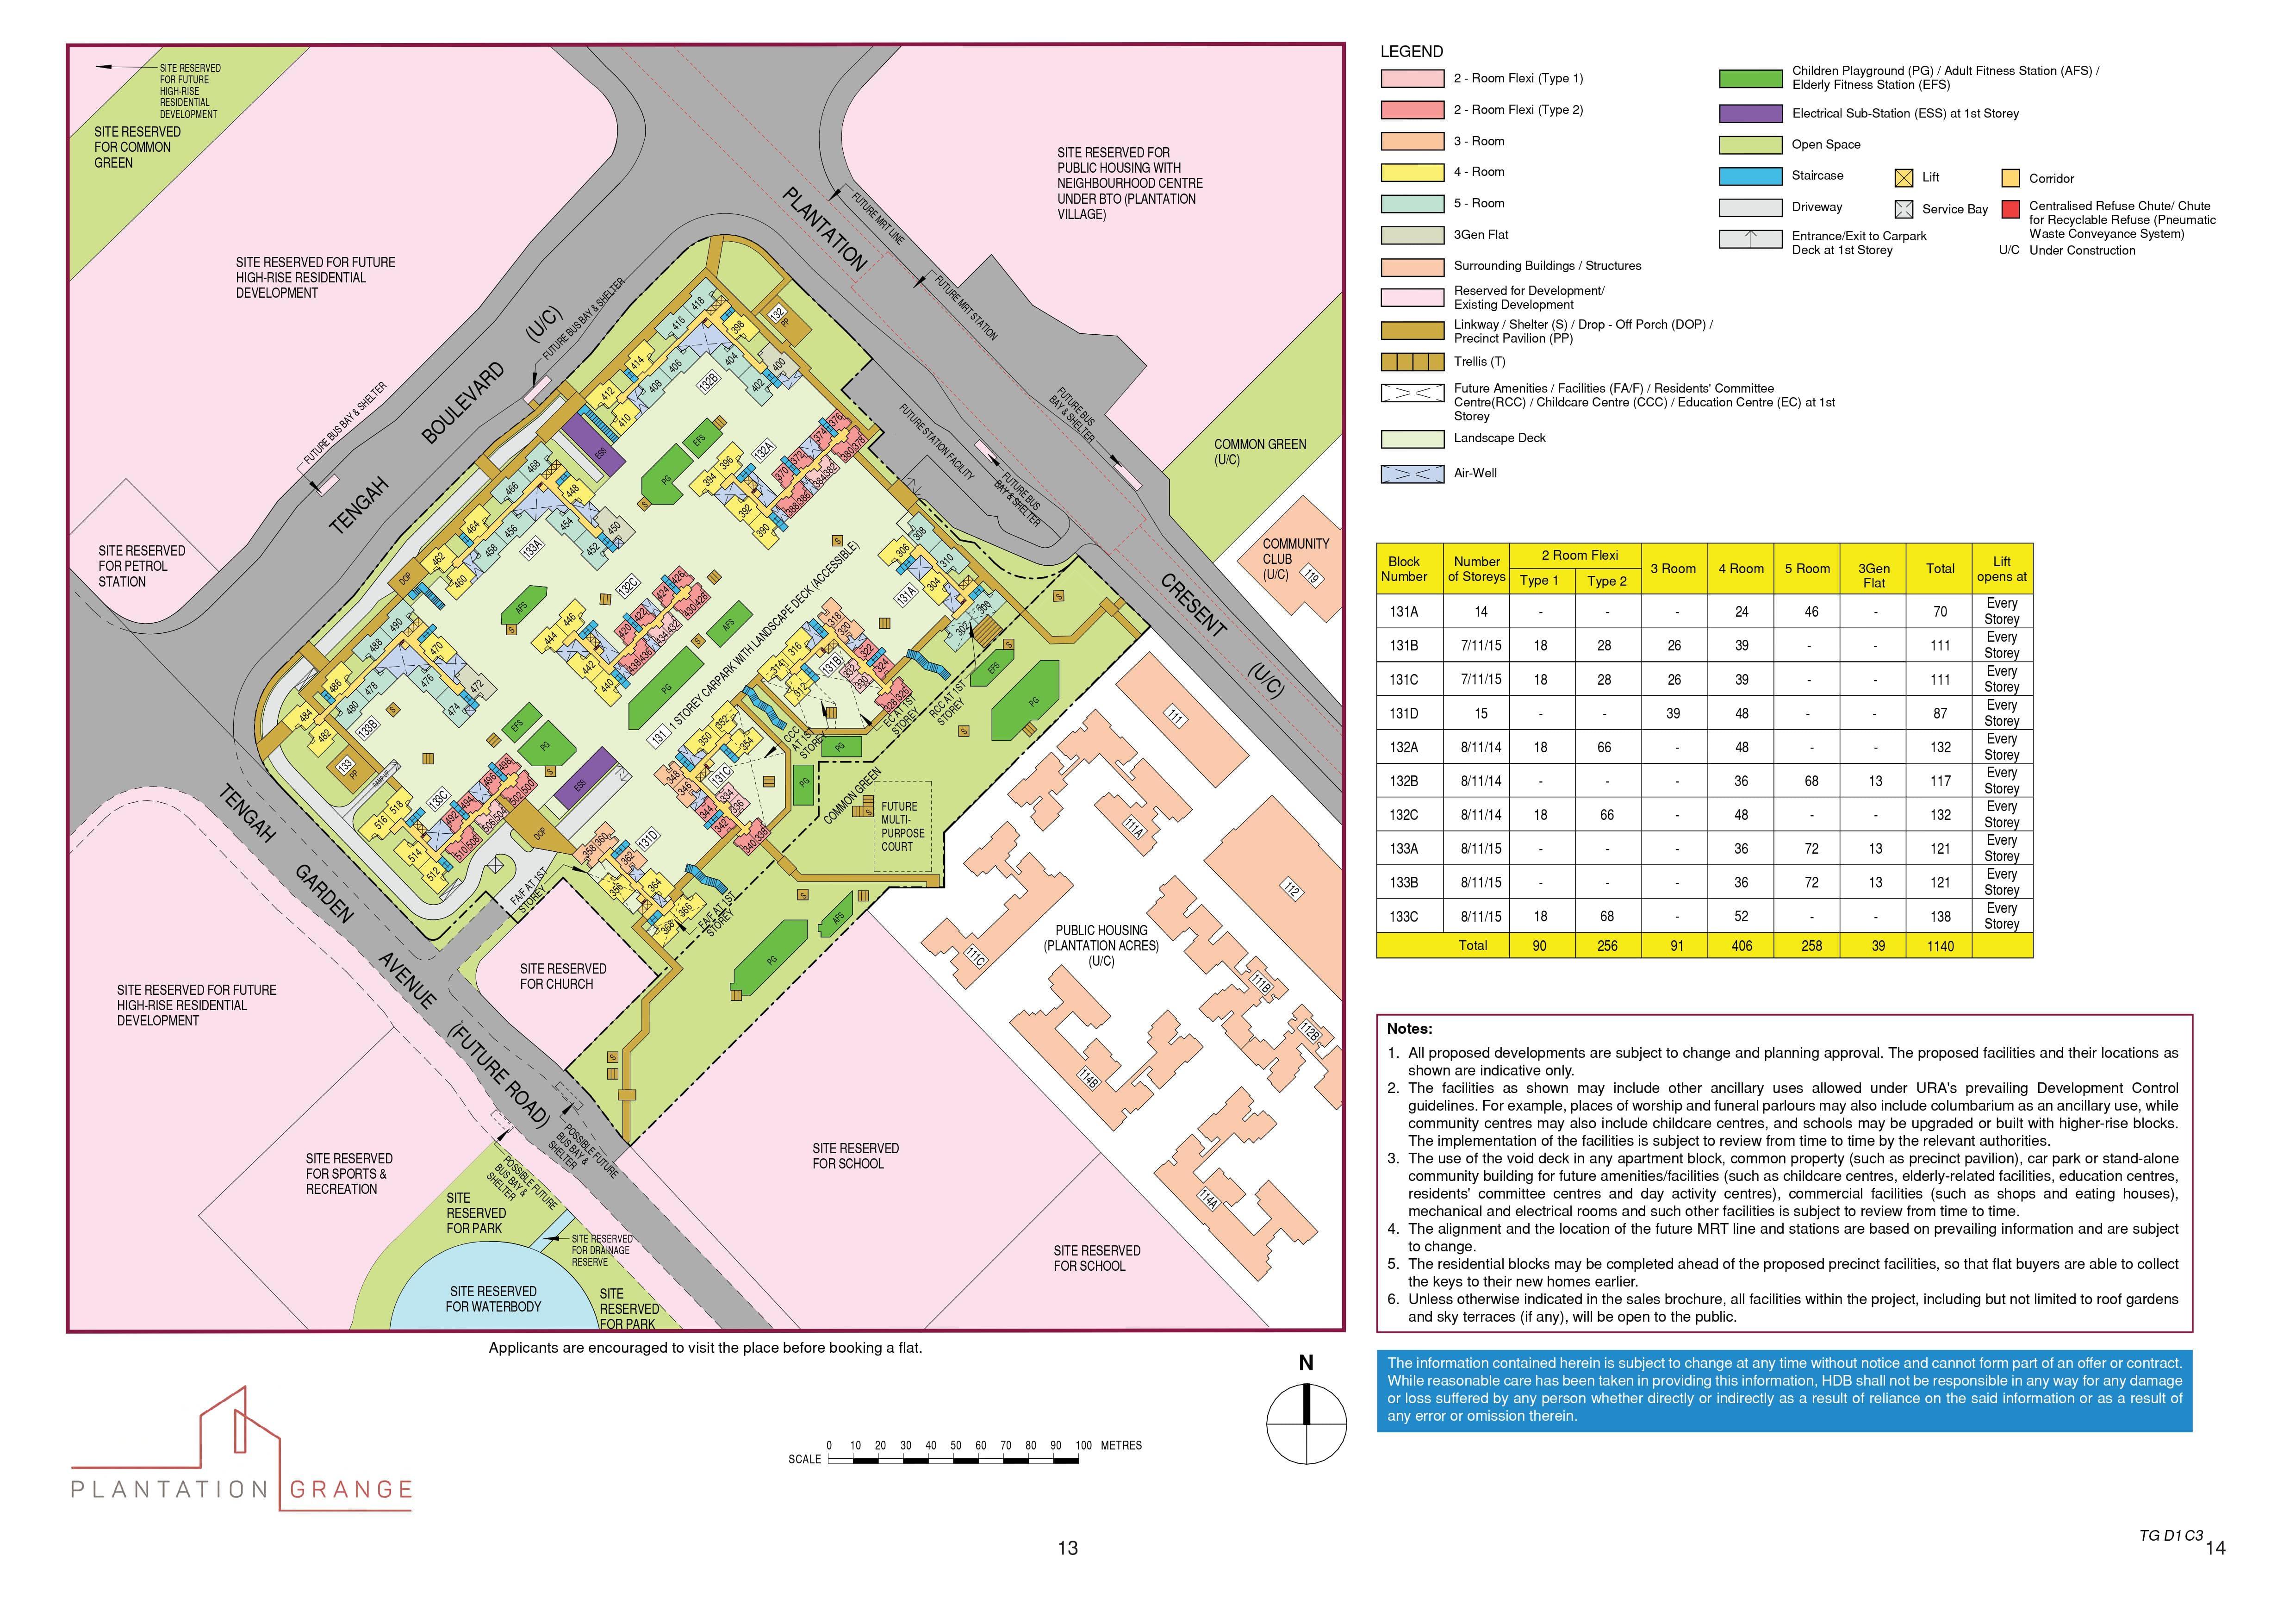 Plantation Grange Site Plan